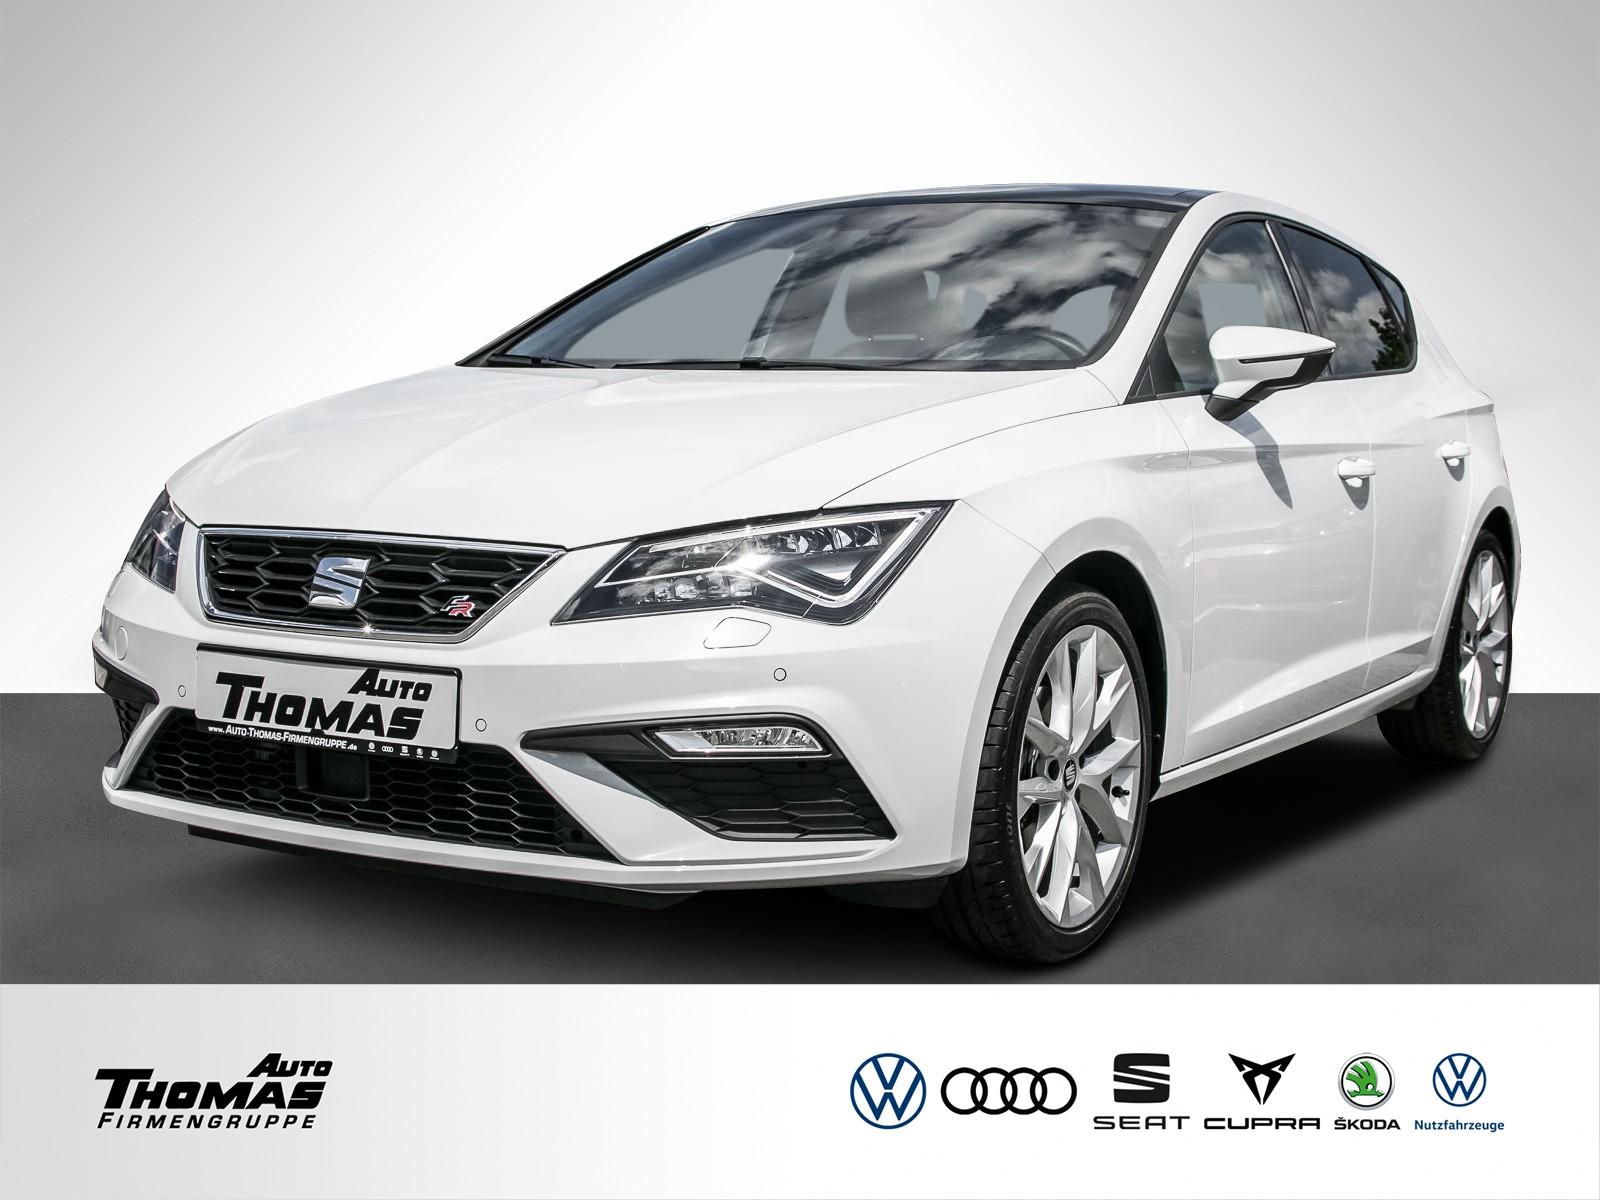 Seat Leon FR 1.5 TSI ACT 110 kW (150 PS) 6-Gang, Jahr 2019, Benzin